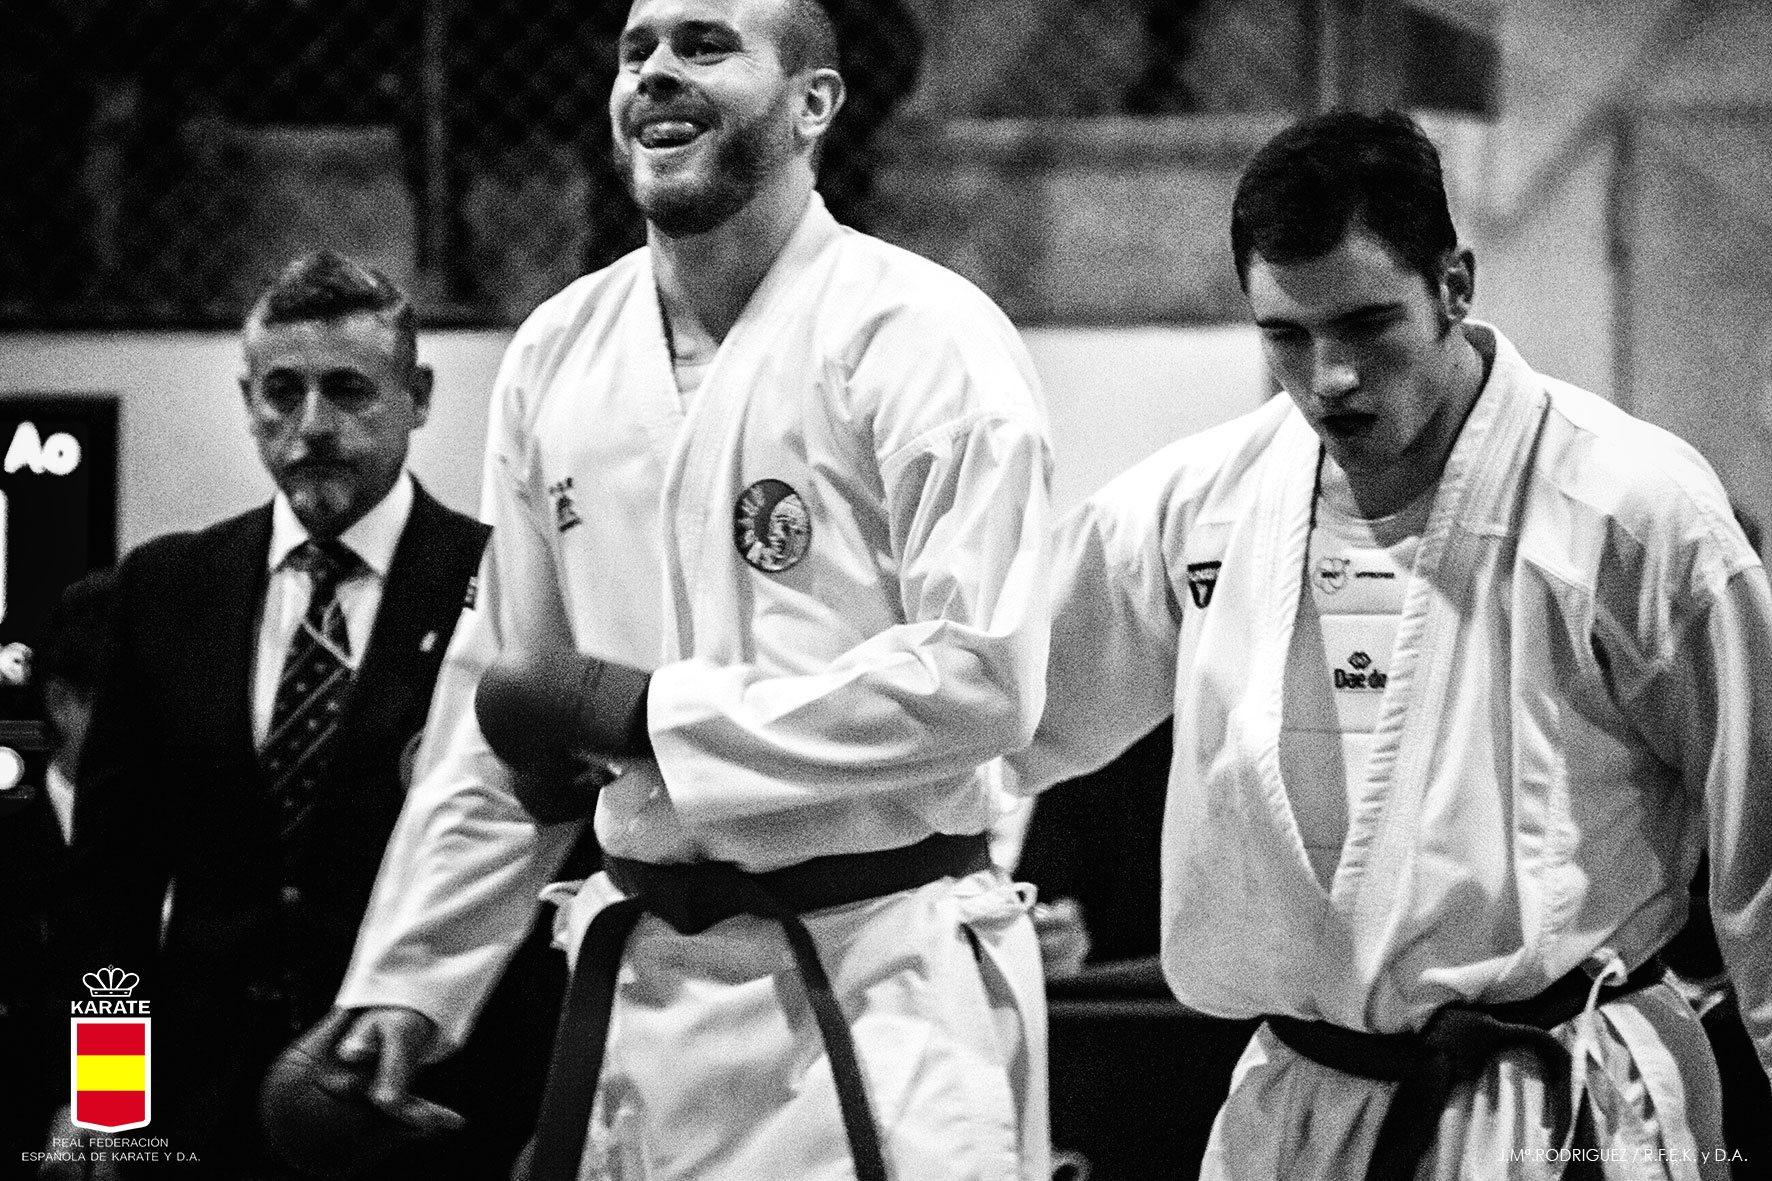 Algunas fotos de la liga Nacional de Karate celebrada en Oviedo